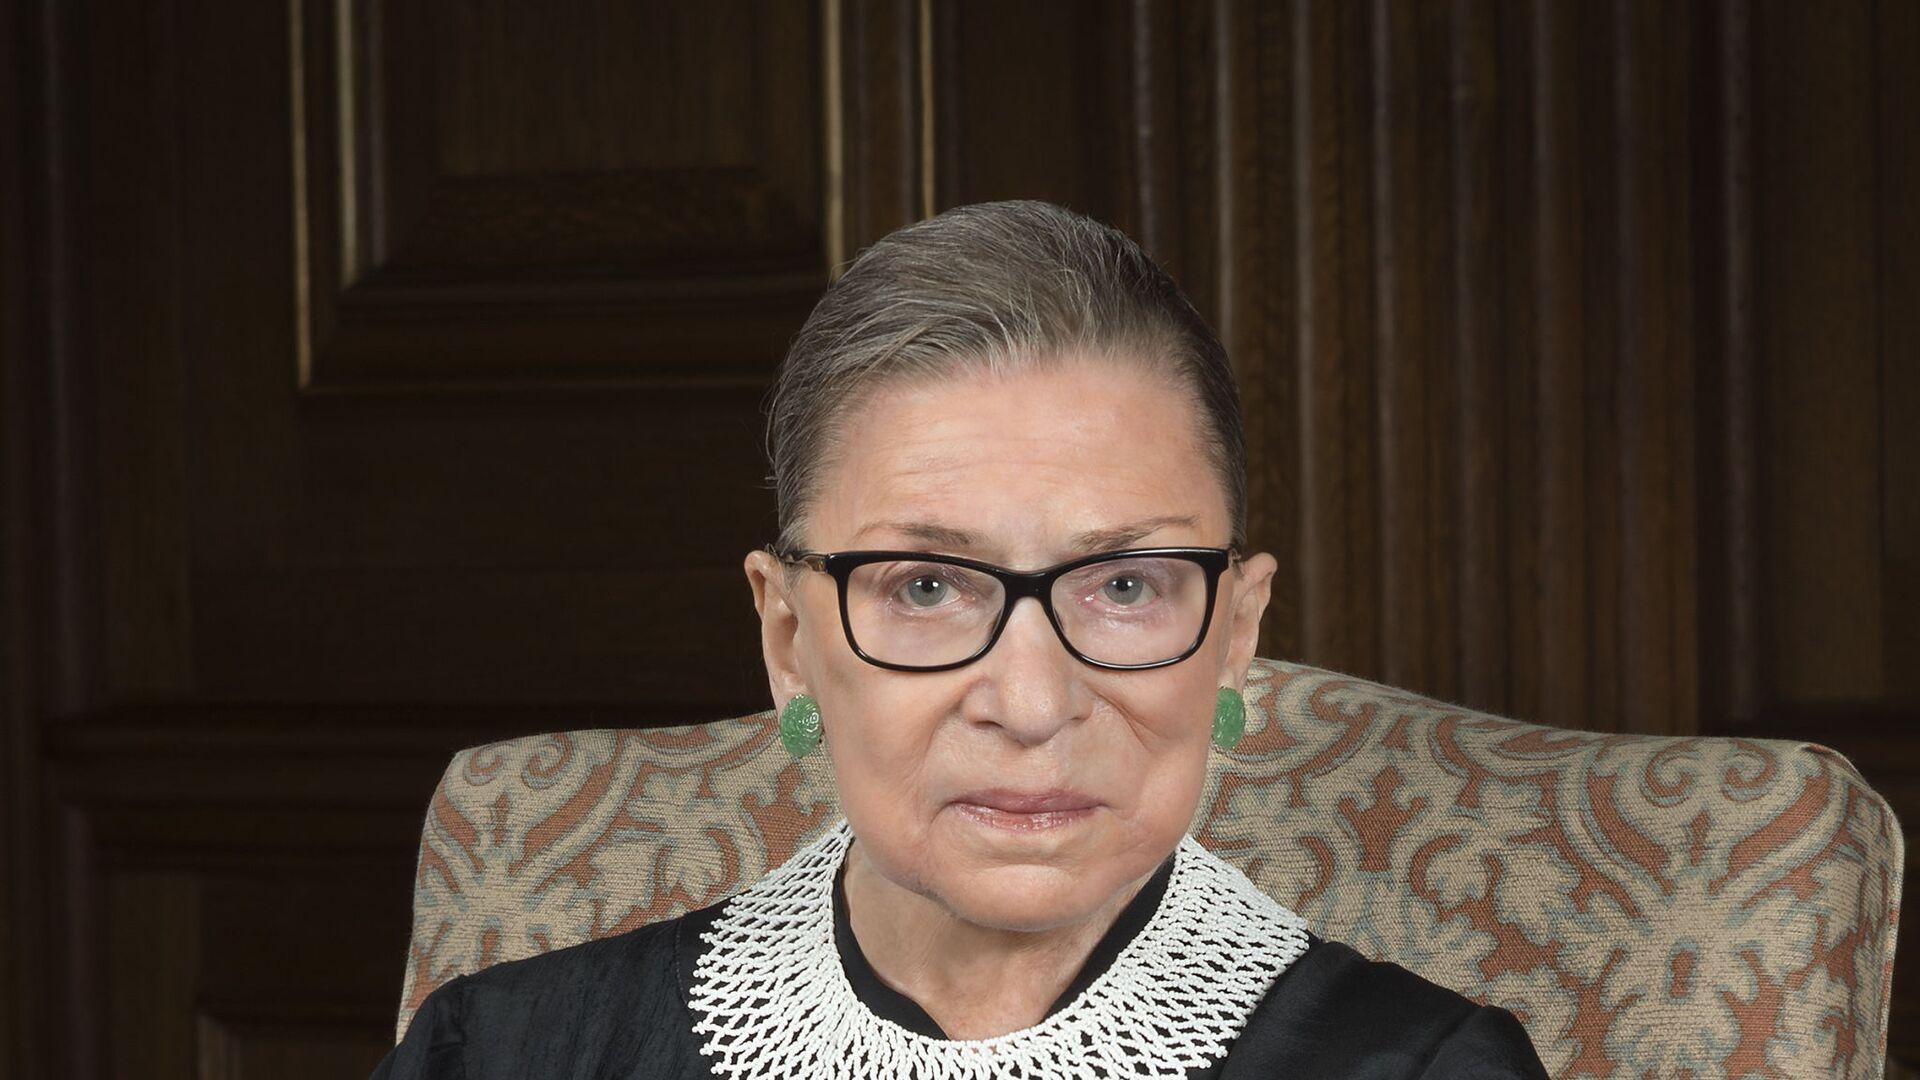 Ruth Bader Ginsburg (2016) - Sputnik International, 1920, 13.10.2021